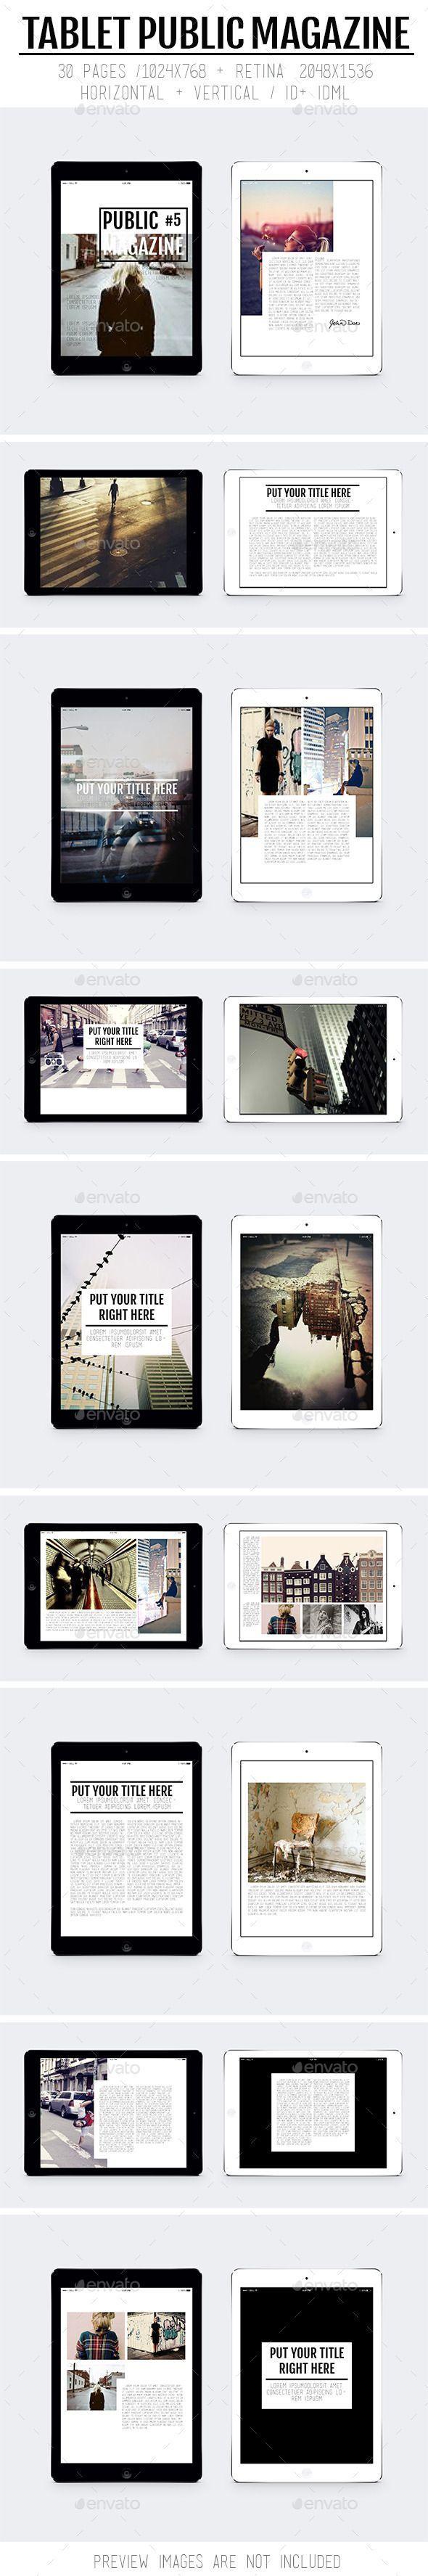 Tablet Public Magazine Template #design Download: http://graphicriver.net/item/tablet-public-magazine/9870326?ref=ksioks: